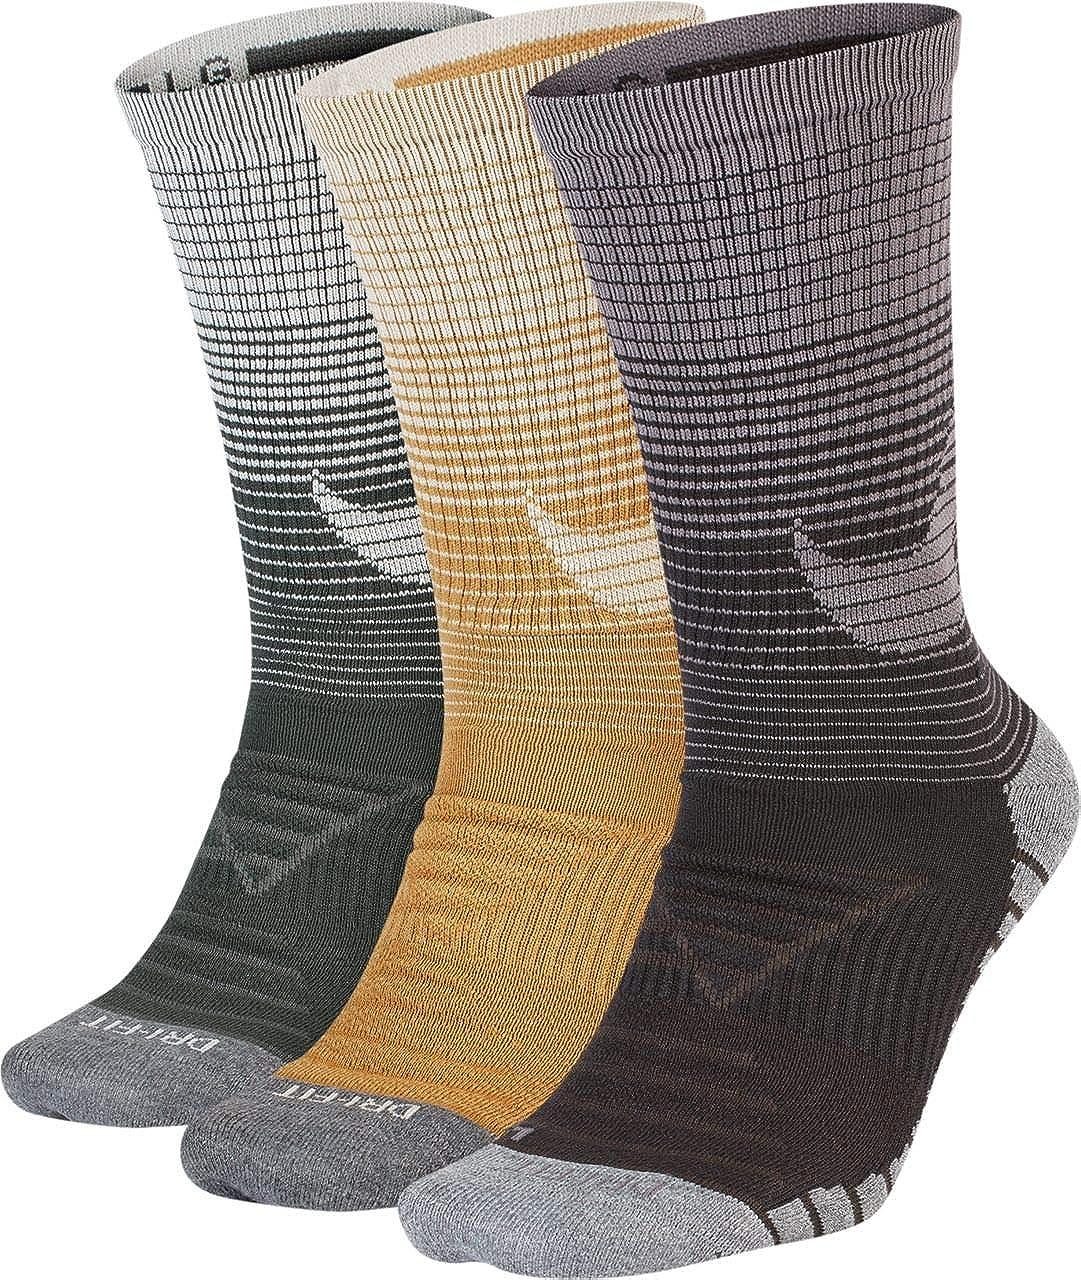 alcachofa de gran calidad de carbono e imitaci/ón a madera Ducha de mano de dise/ño 3/chorros ducha wellness de primera clase WOOD cabezal grande con un di/ámetro de 130/mm